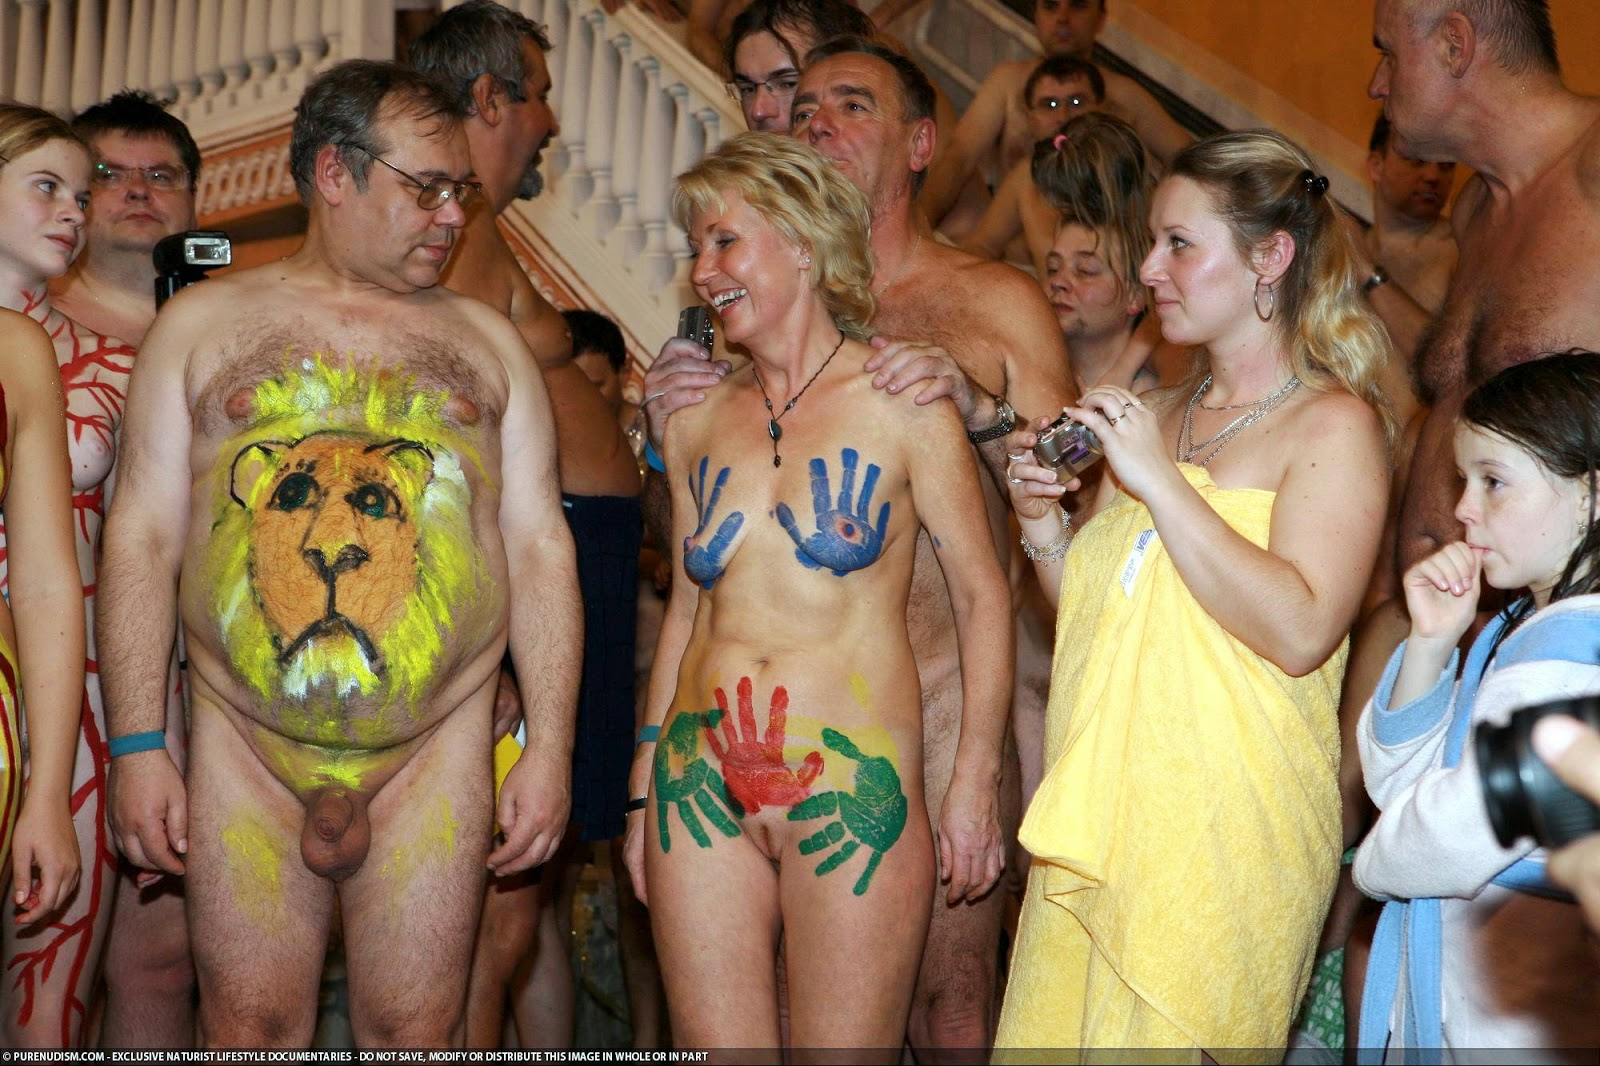 Nudism - Photo - HQ : Family Nudism POOL!